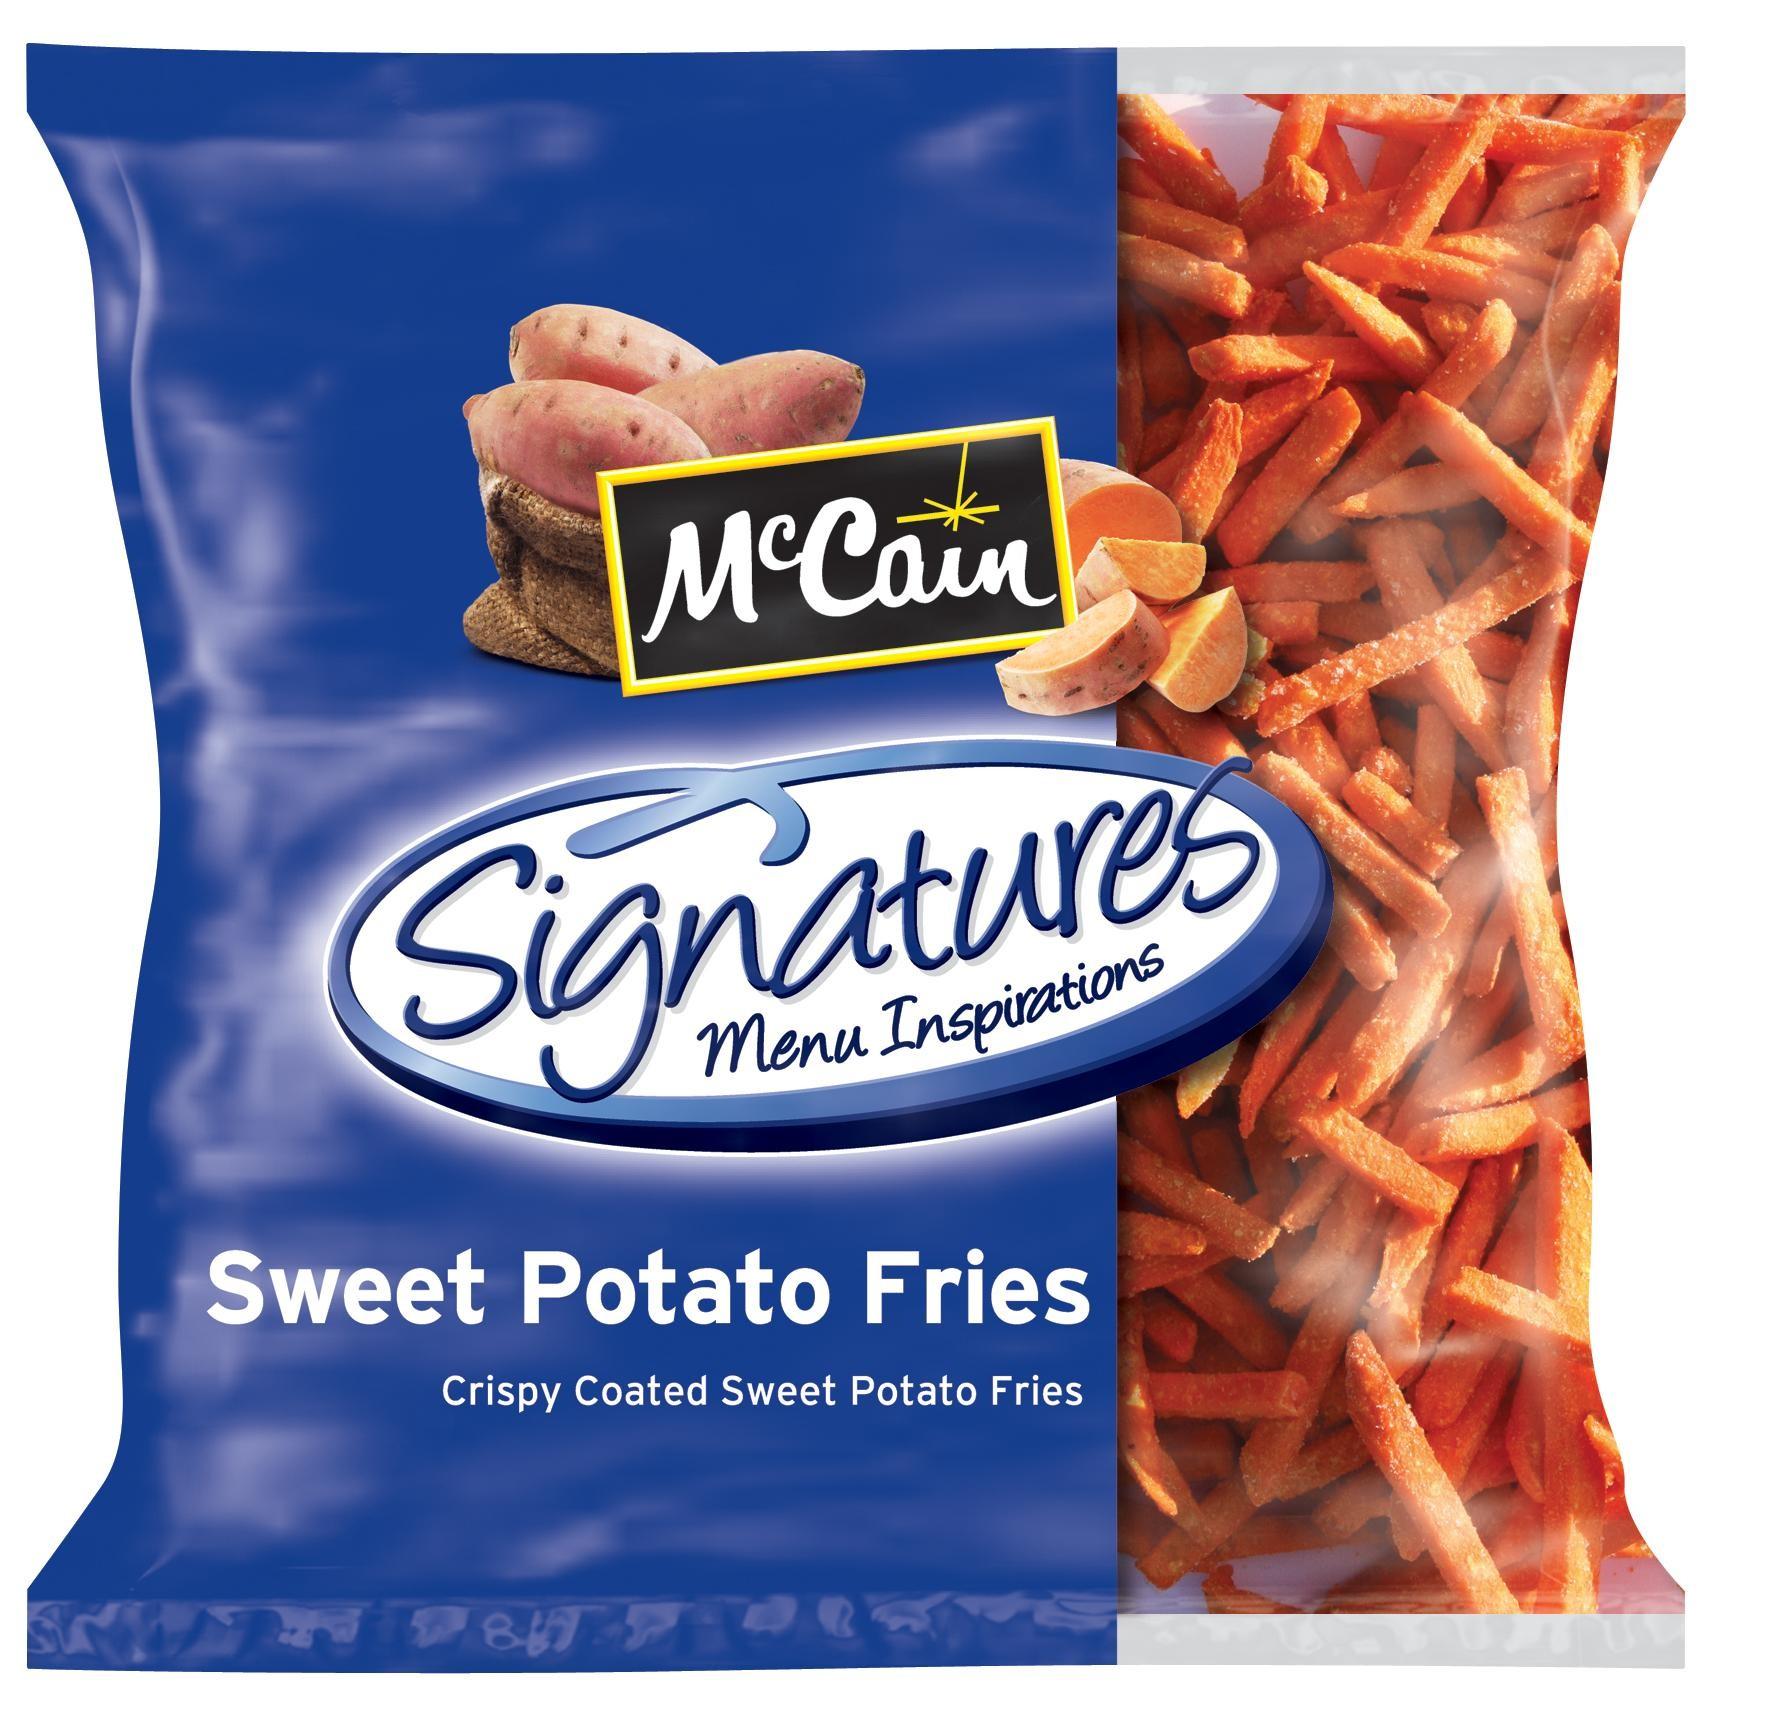 McCain Sweet Potato Fries